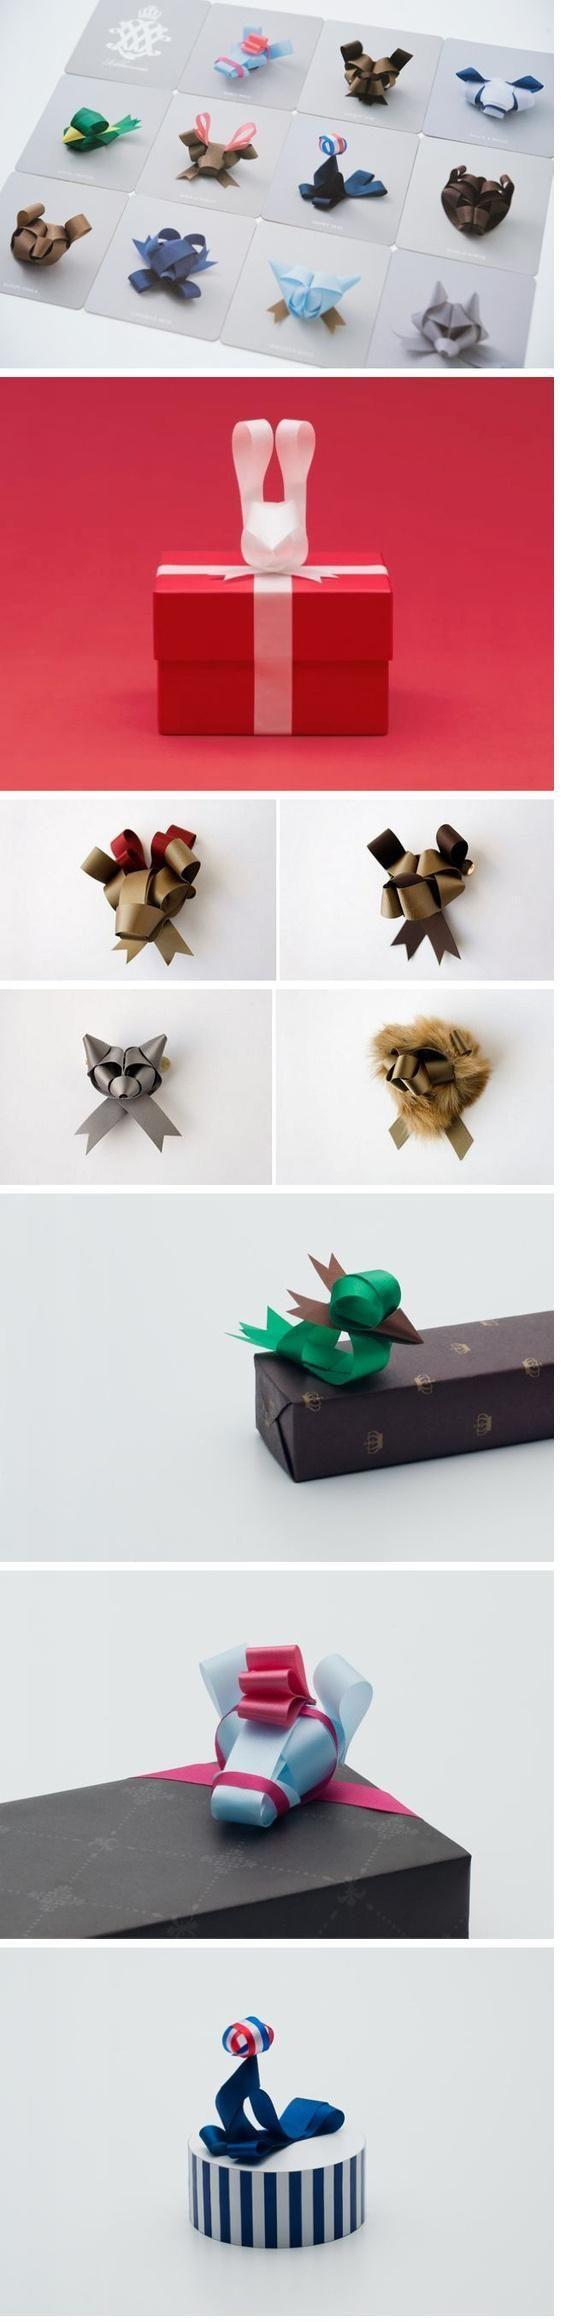 Awesome ribbon wrap ideas